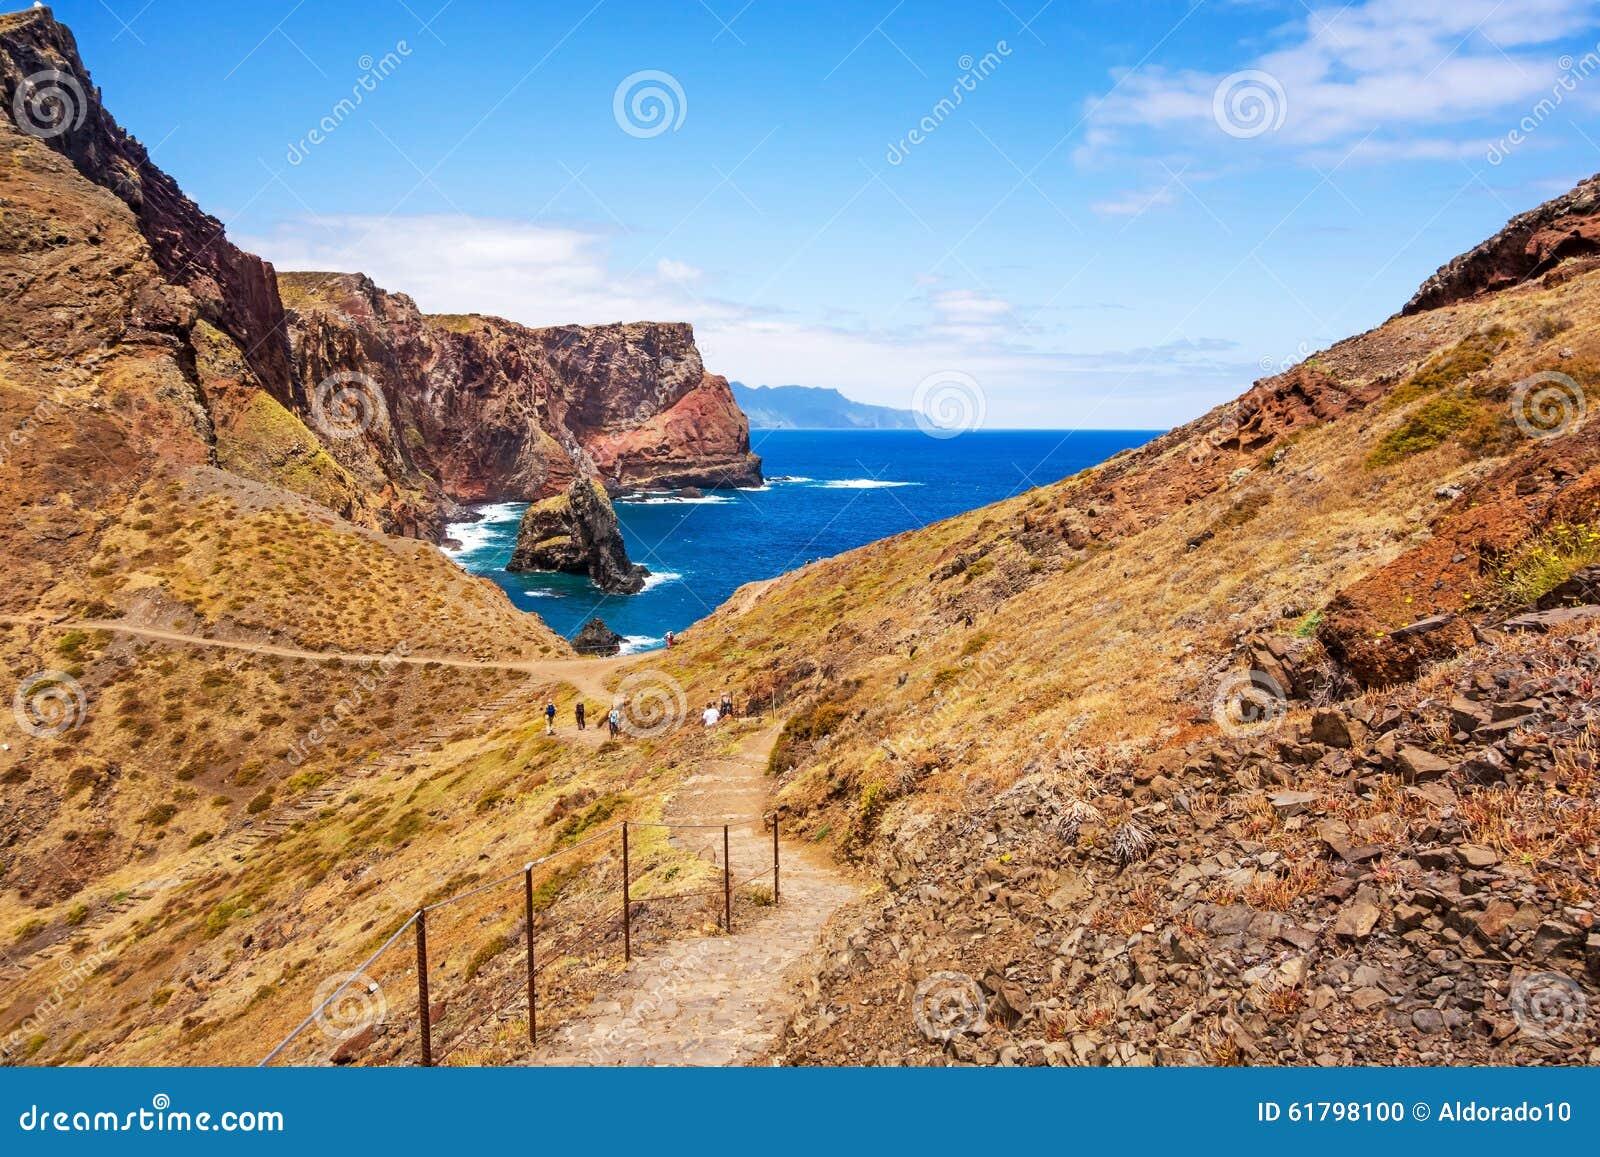 Madeira bay at ponta de sao lourenco stock photo image for Landscaping rocks east bay